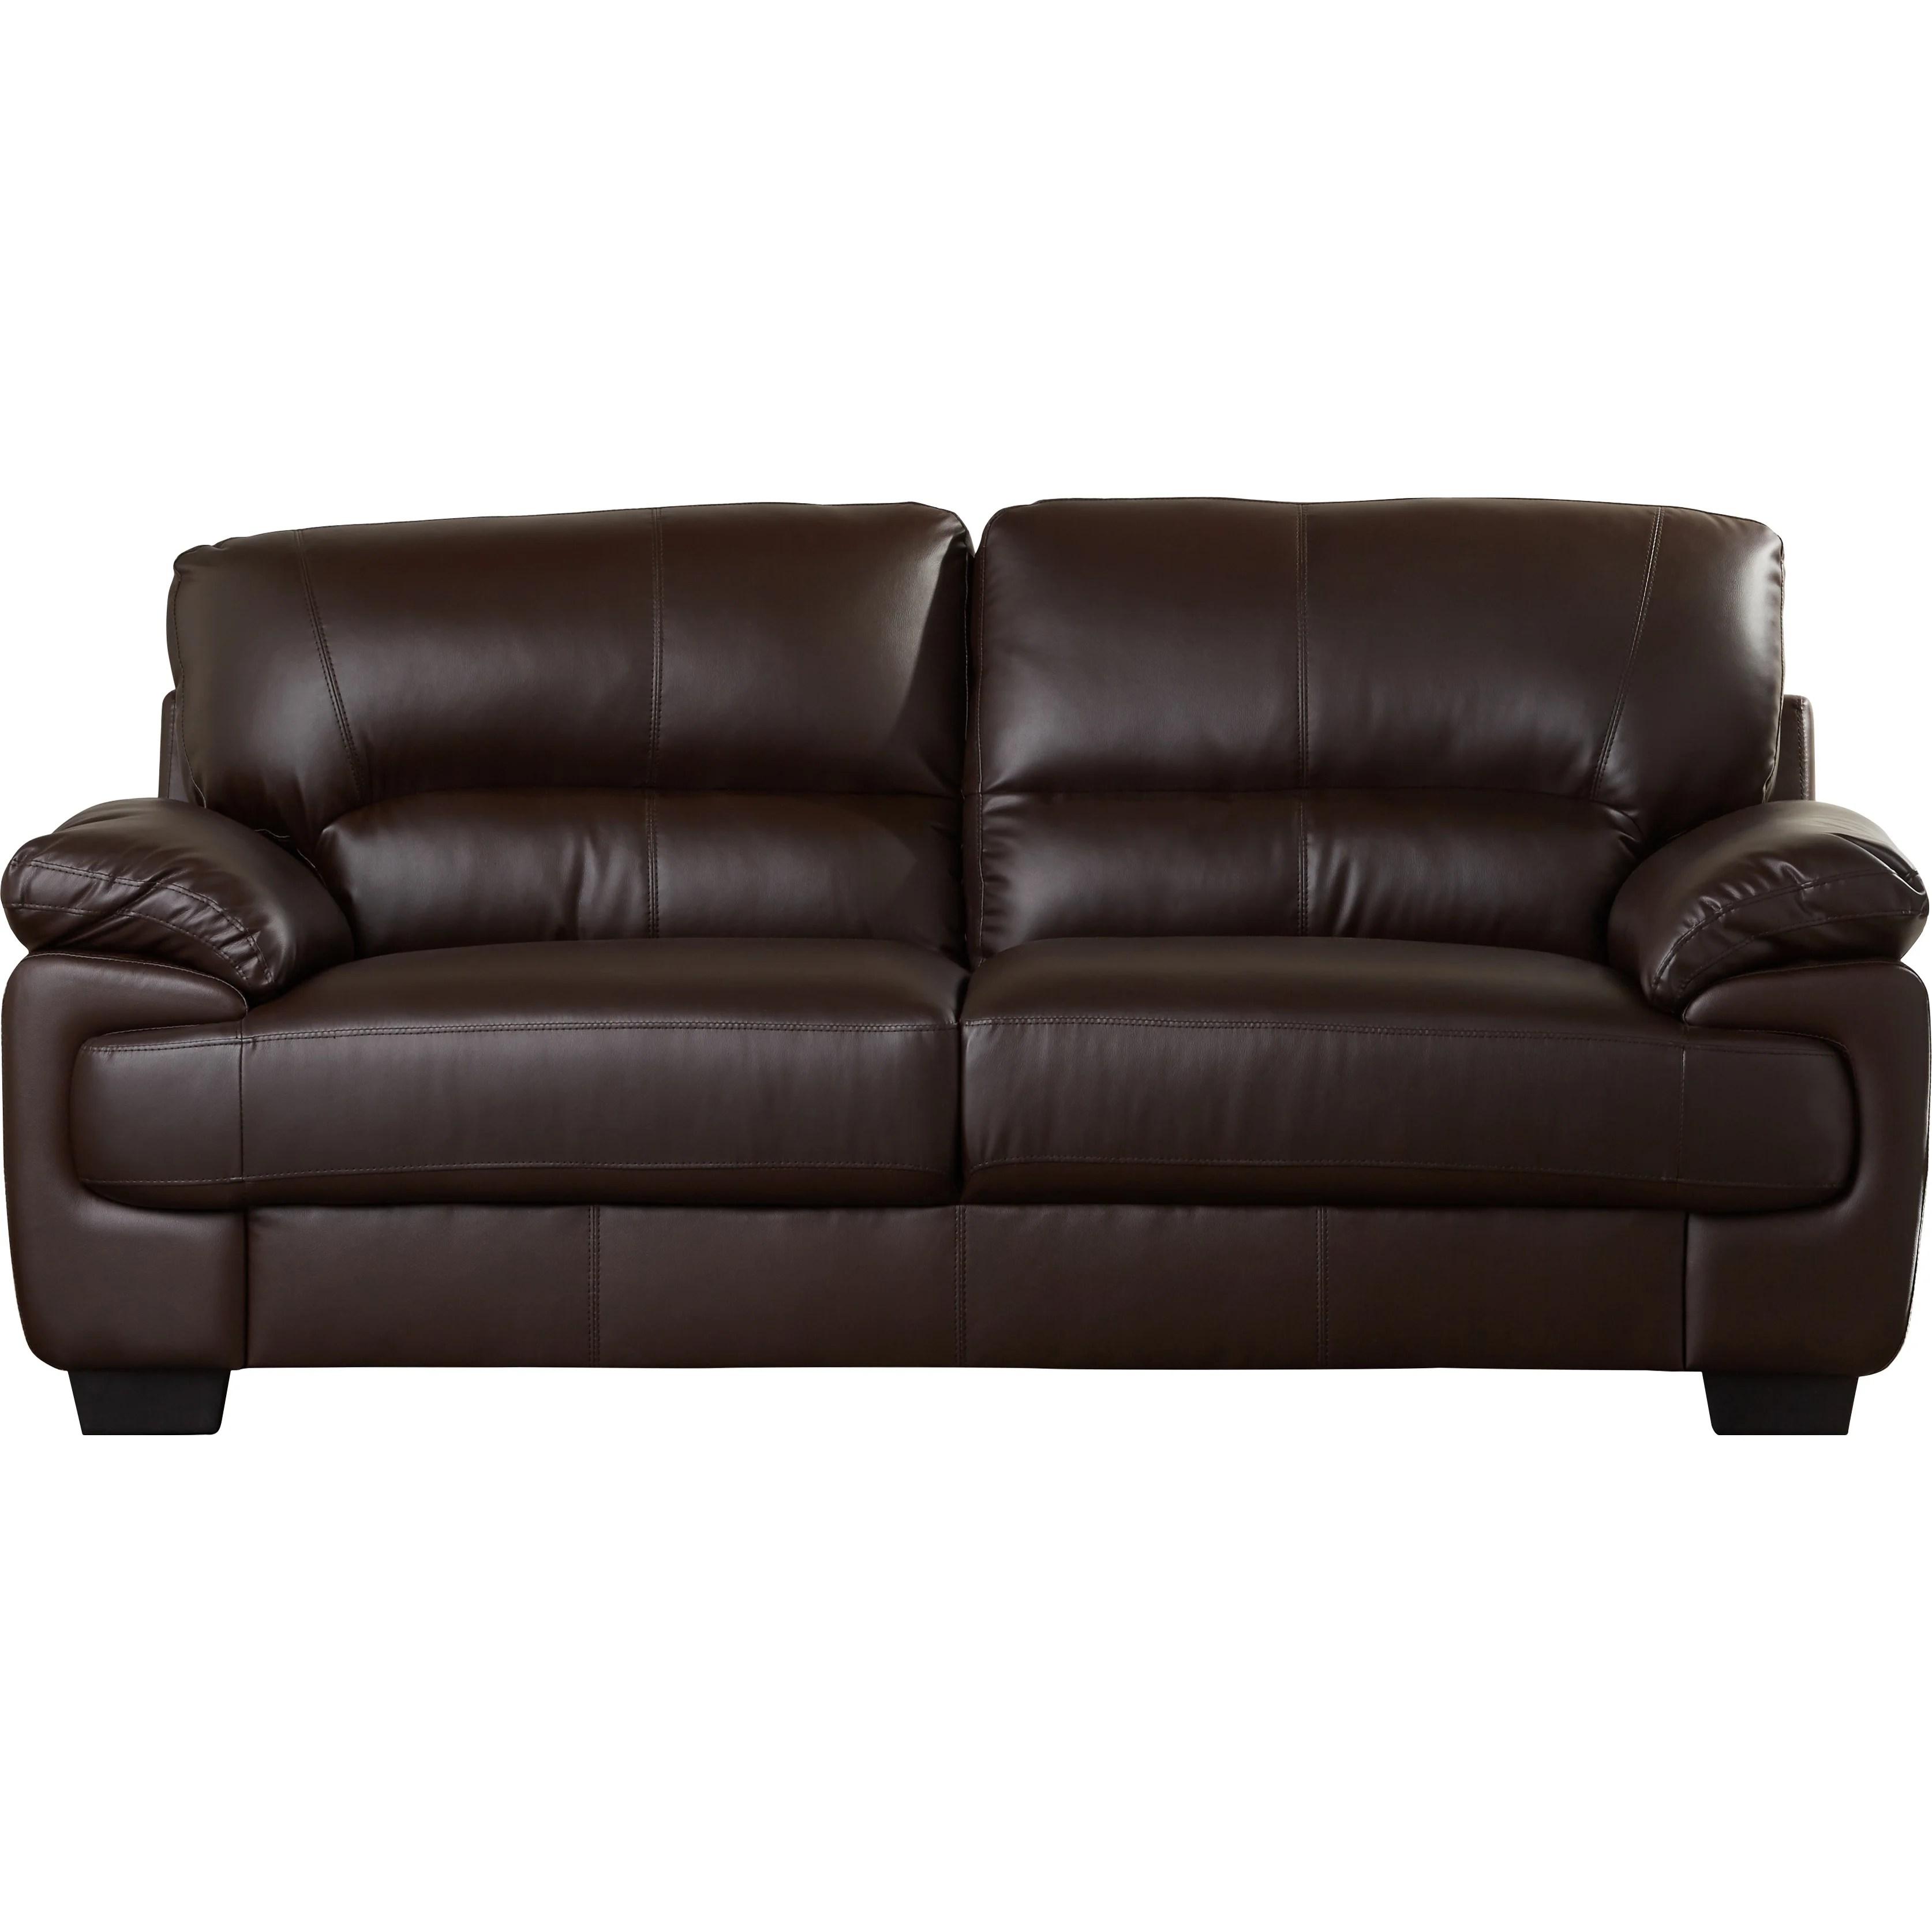 3 seater sofa throws uk bean bag bed india three posts erwin and reviews wayfair